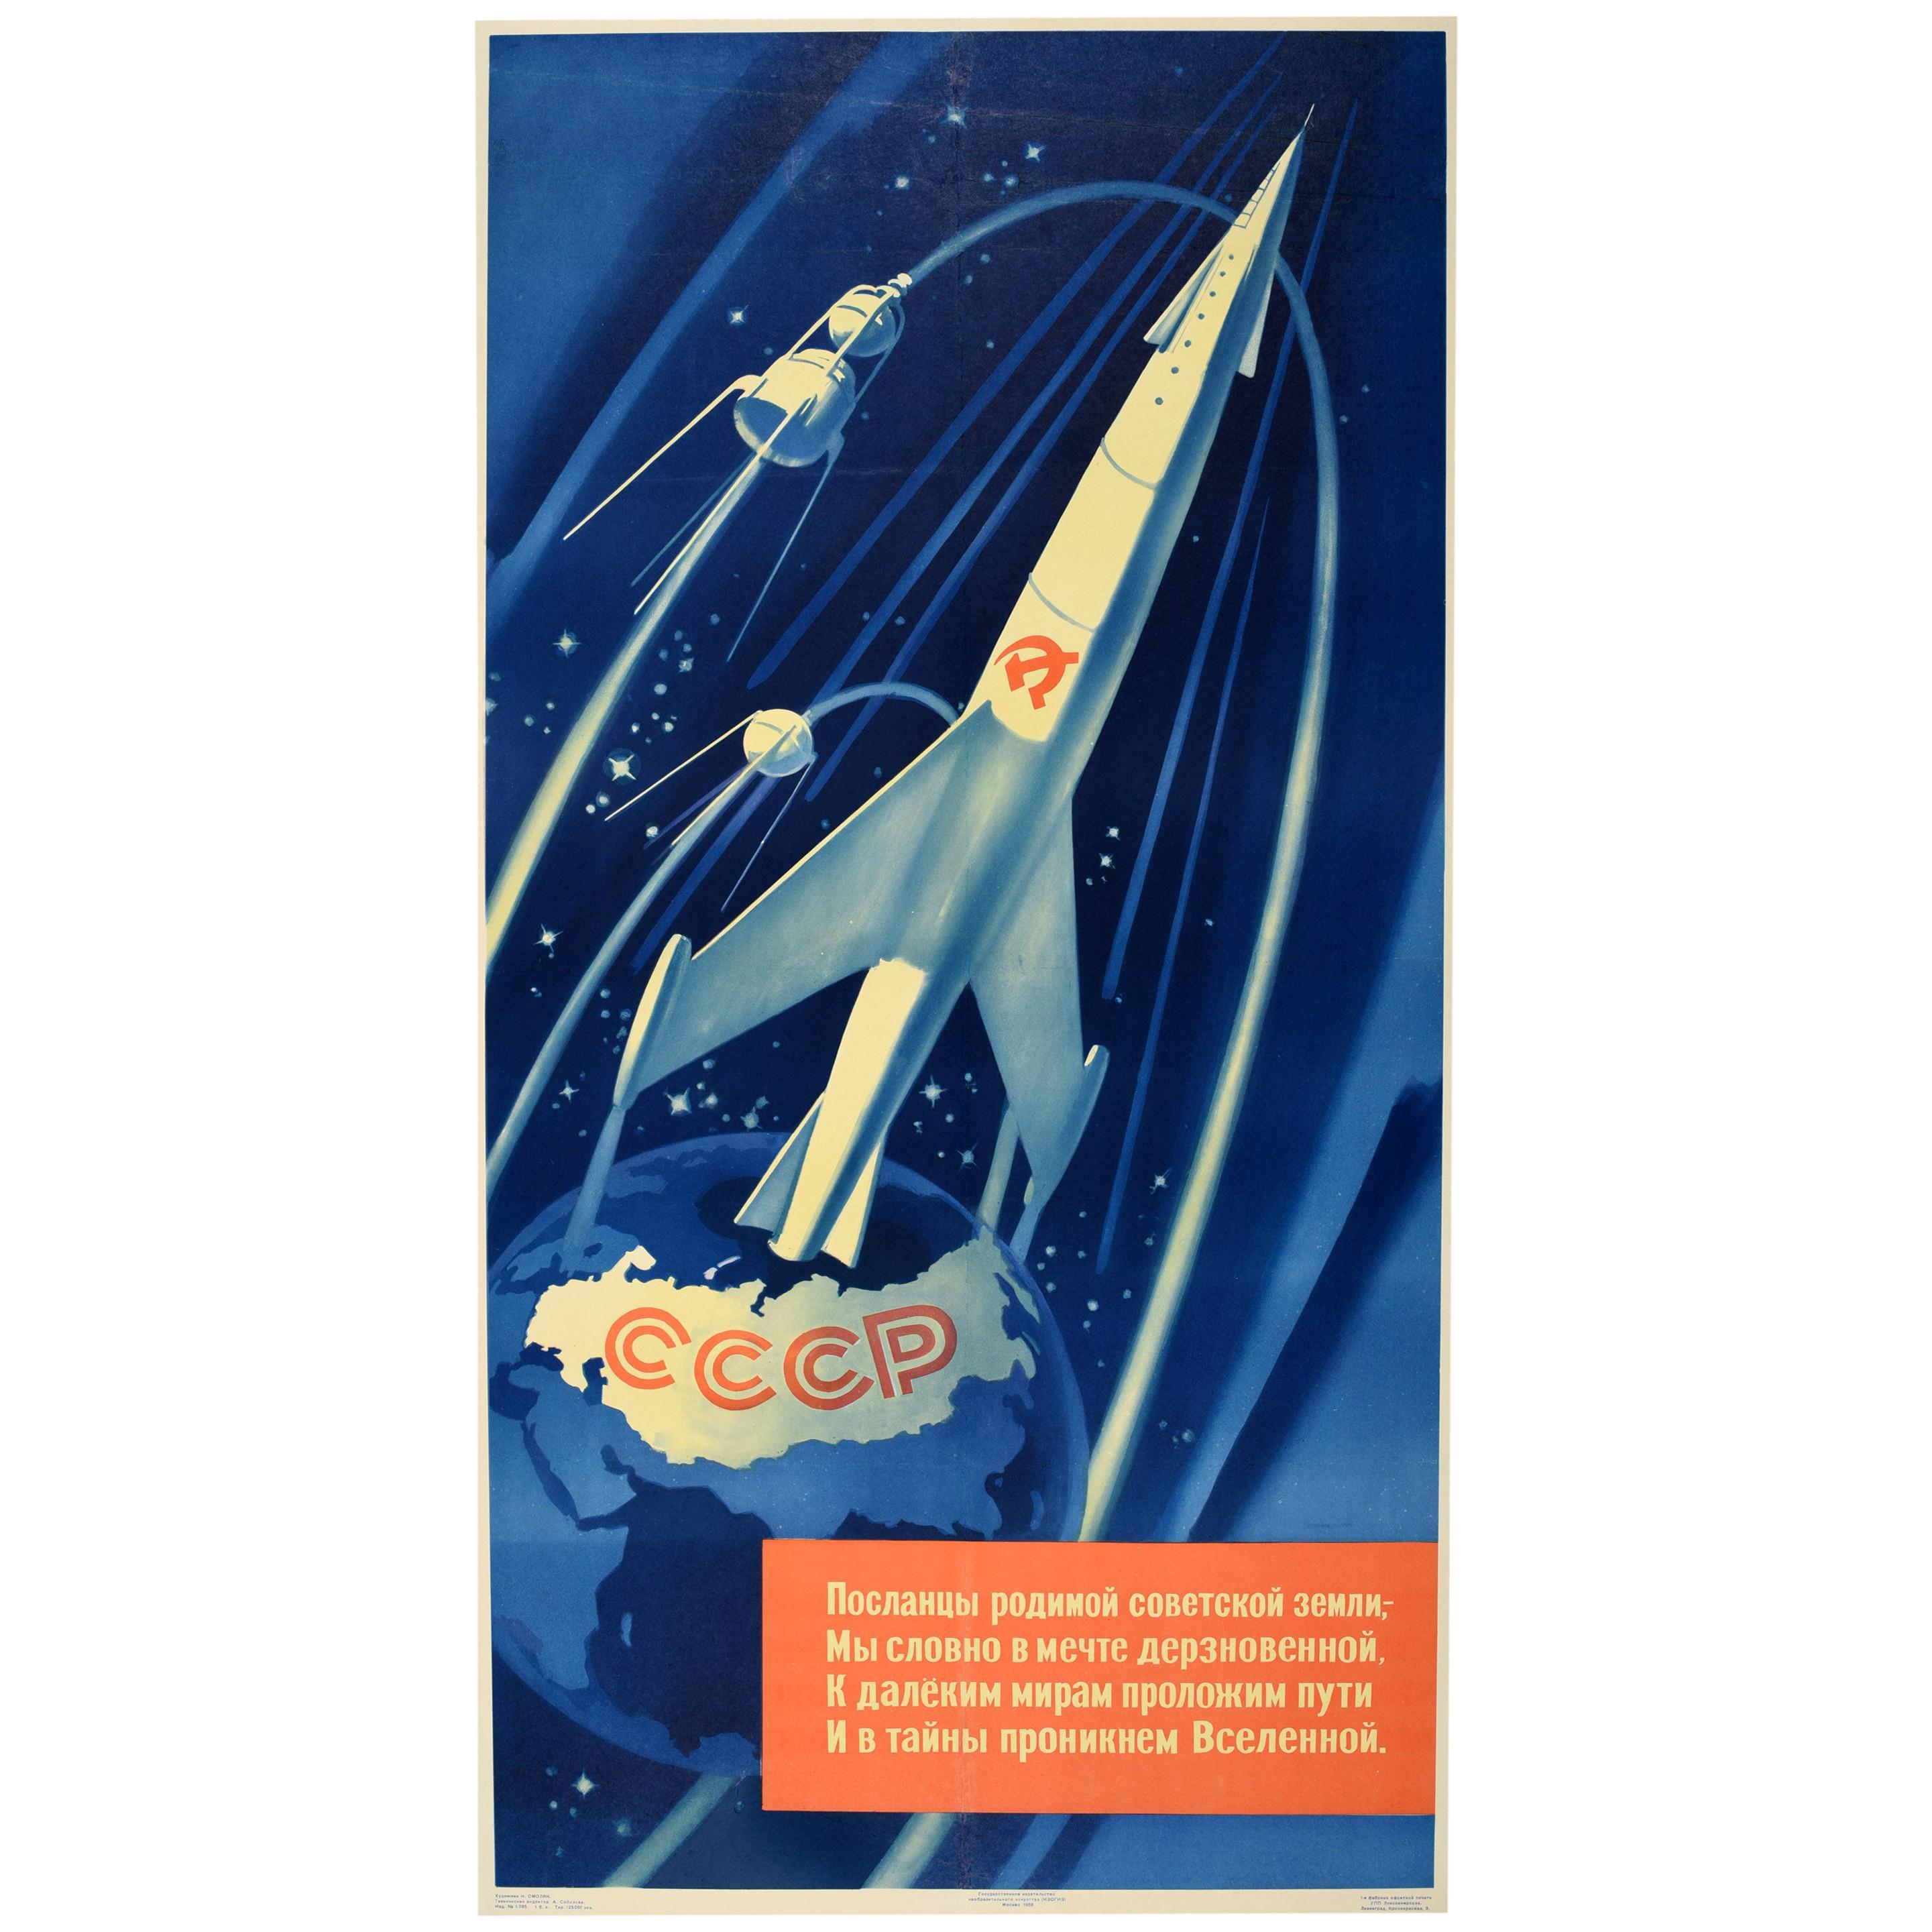 Original Vintage Poster Soviet Rocket Universe Exploration Space Race Propaganda